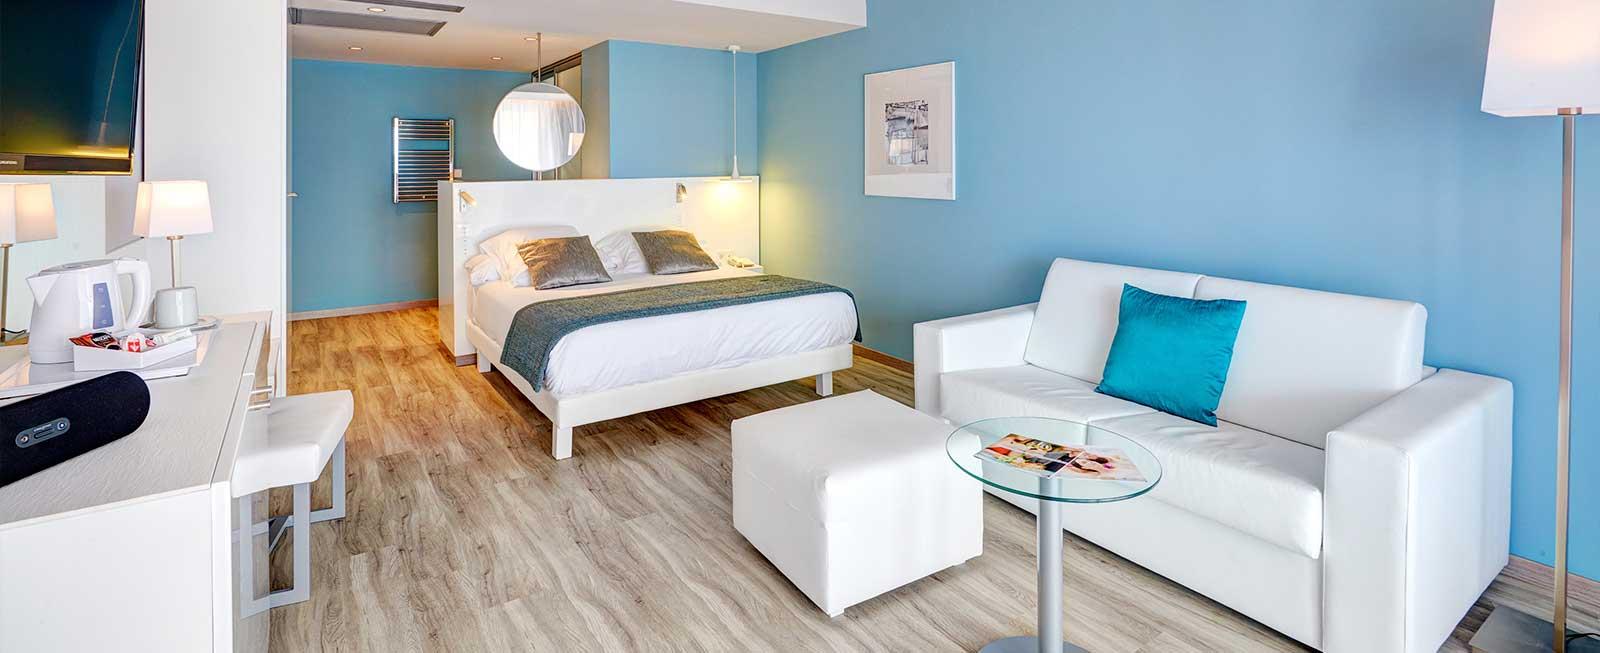 Rooms At Protur Alicia Hotel Cala Bona